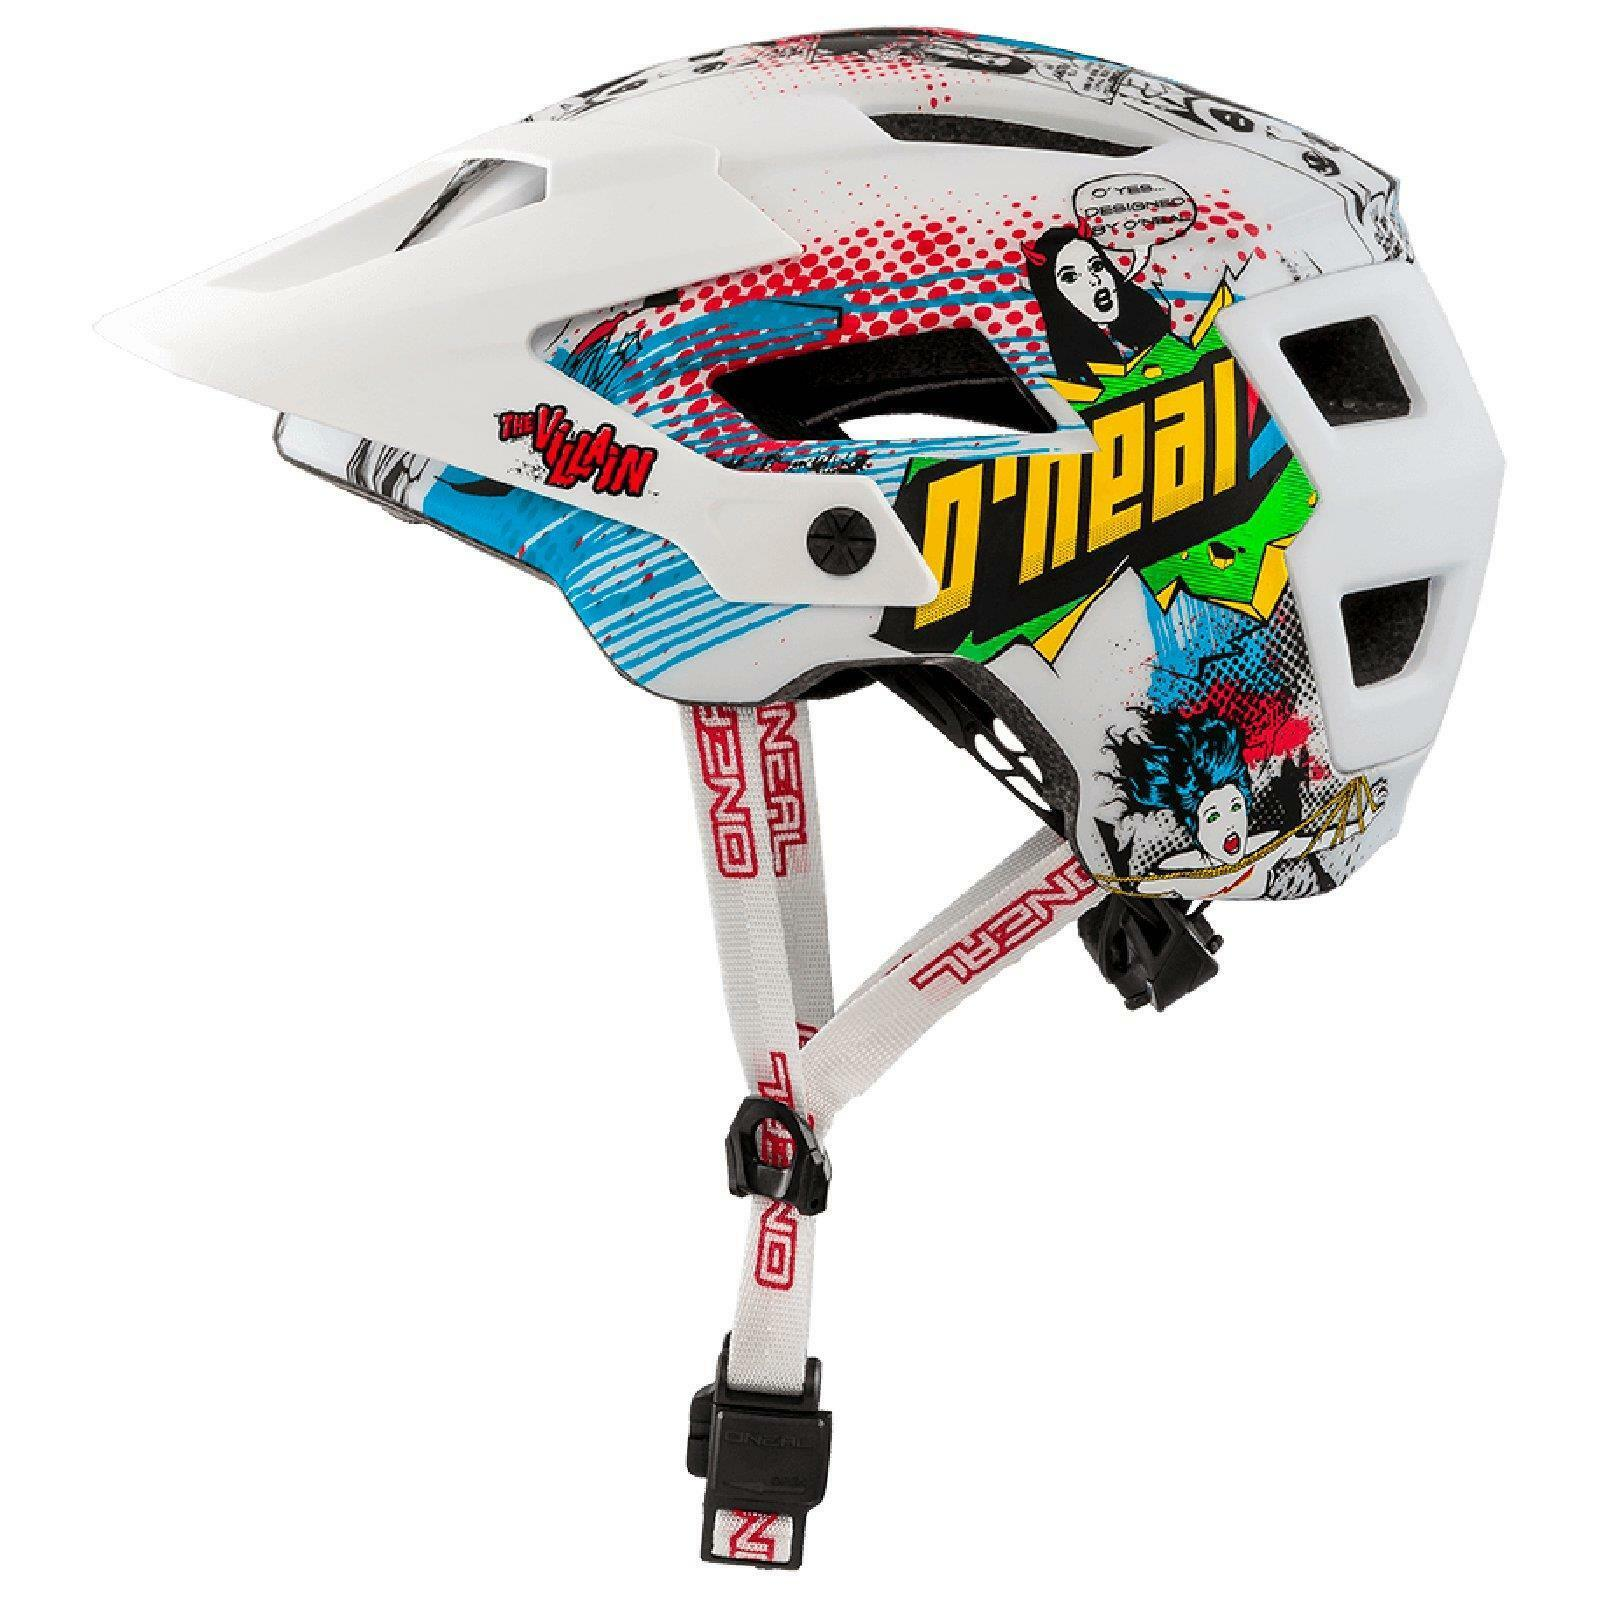 ONeal defensor 2.0 villano blancoo casco Enduro rastro de la bici bicicleta de montaña todo MTB